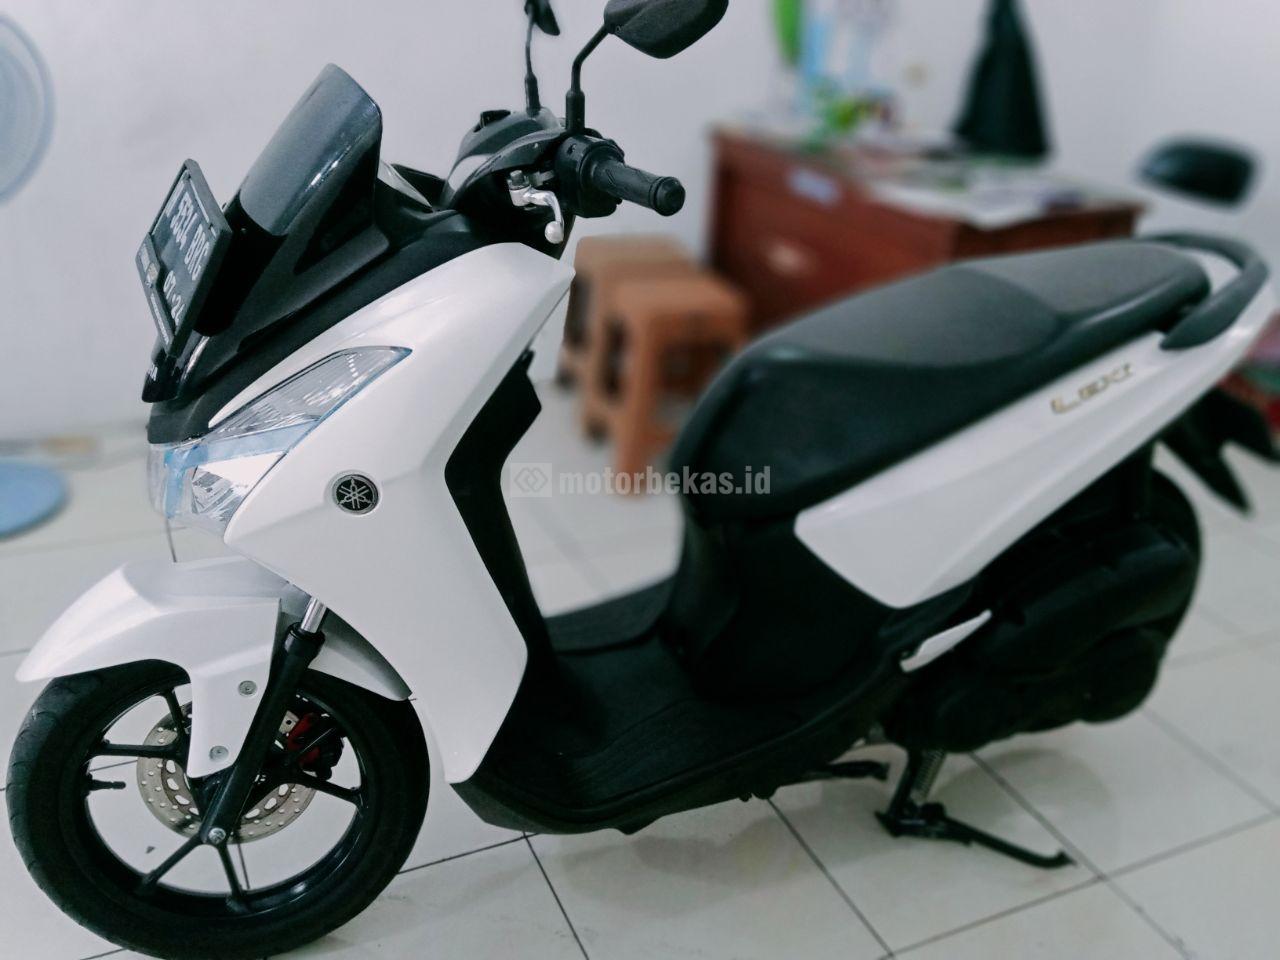 YAMAHA LEXI FI 952 motorbekas.id